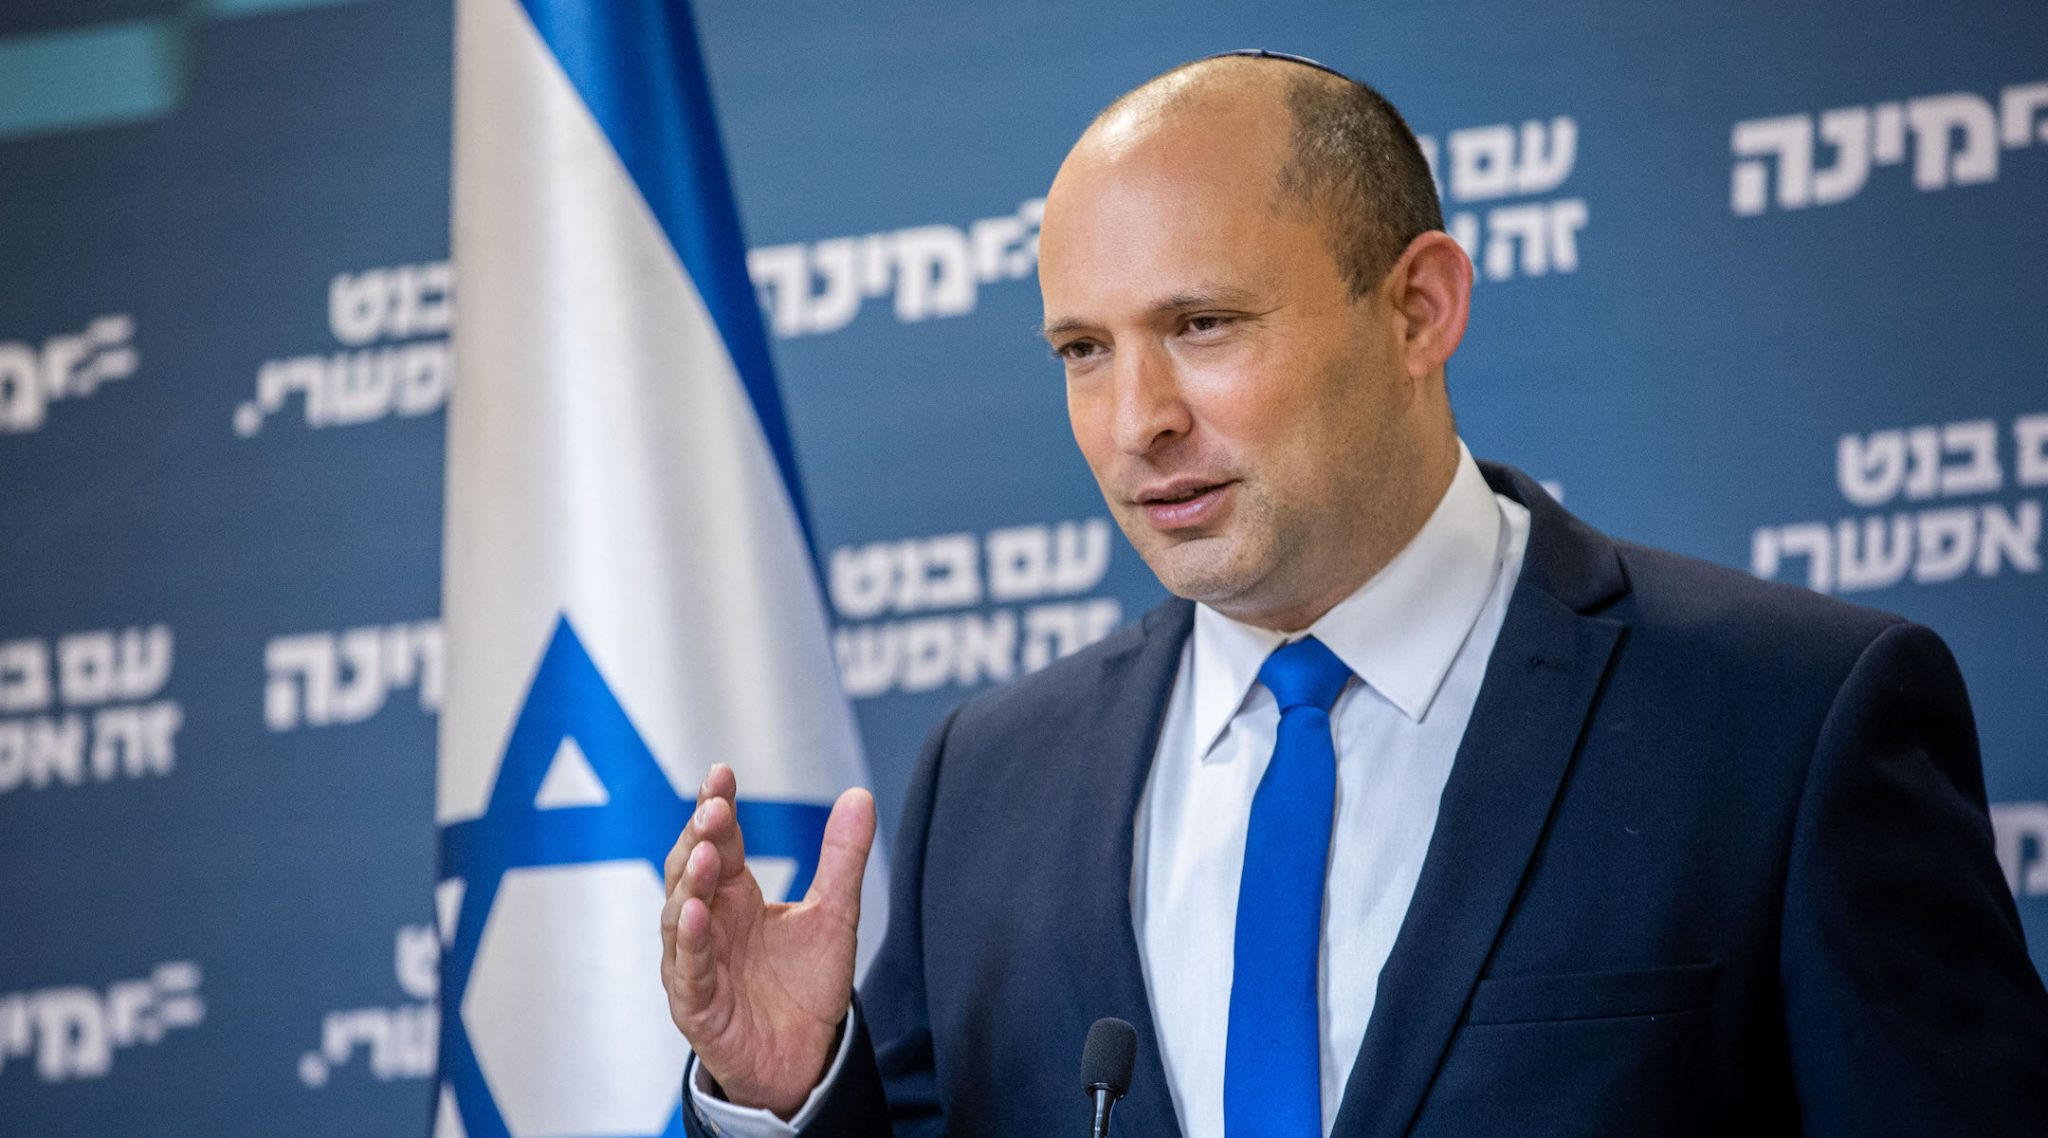 Naftali Bennett gives a press conference at the Knesset, the Israeli parliament in Jerusalem, April 21, 2021. (Photo/JTA-Yonatan Sindel-Flash90)